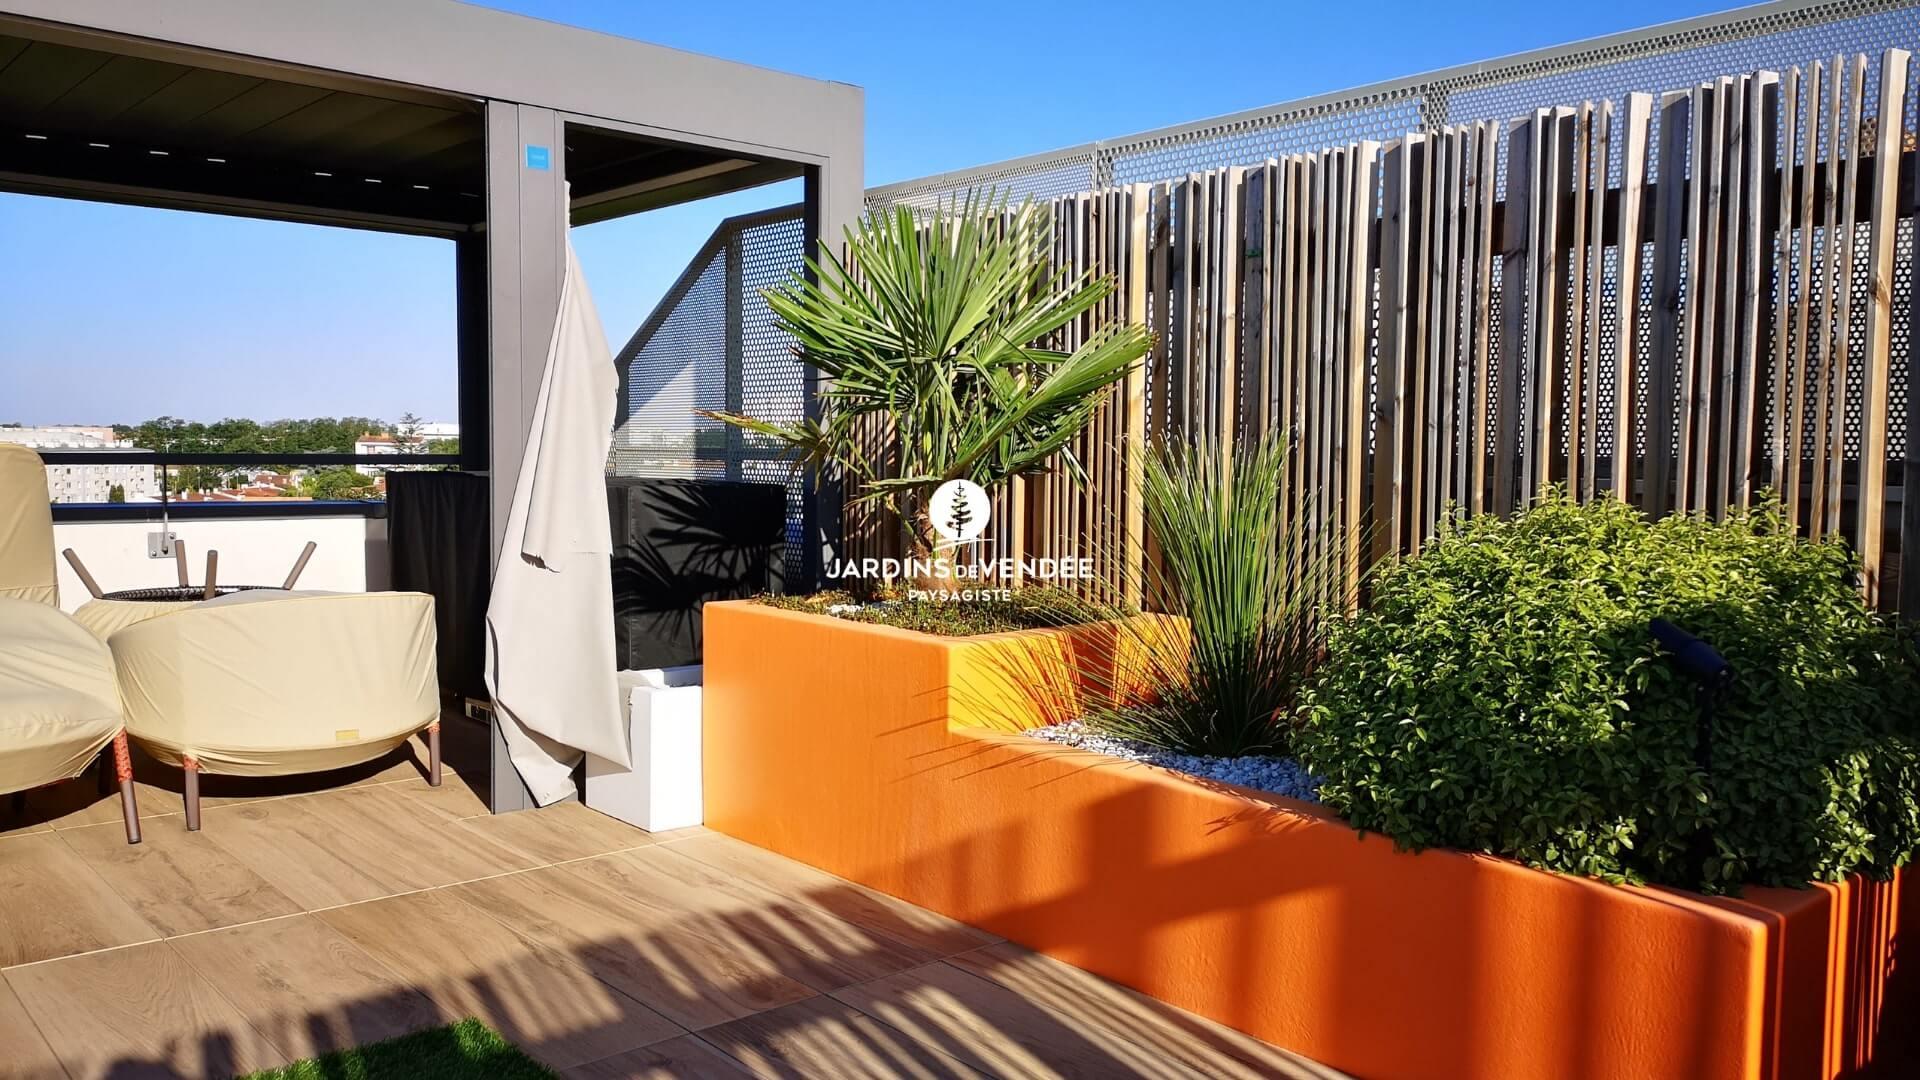 jardinsdevendee-realisations-amenagement-balcon(2)